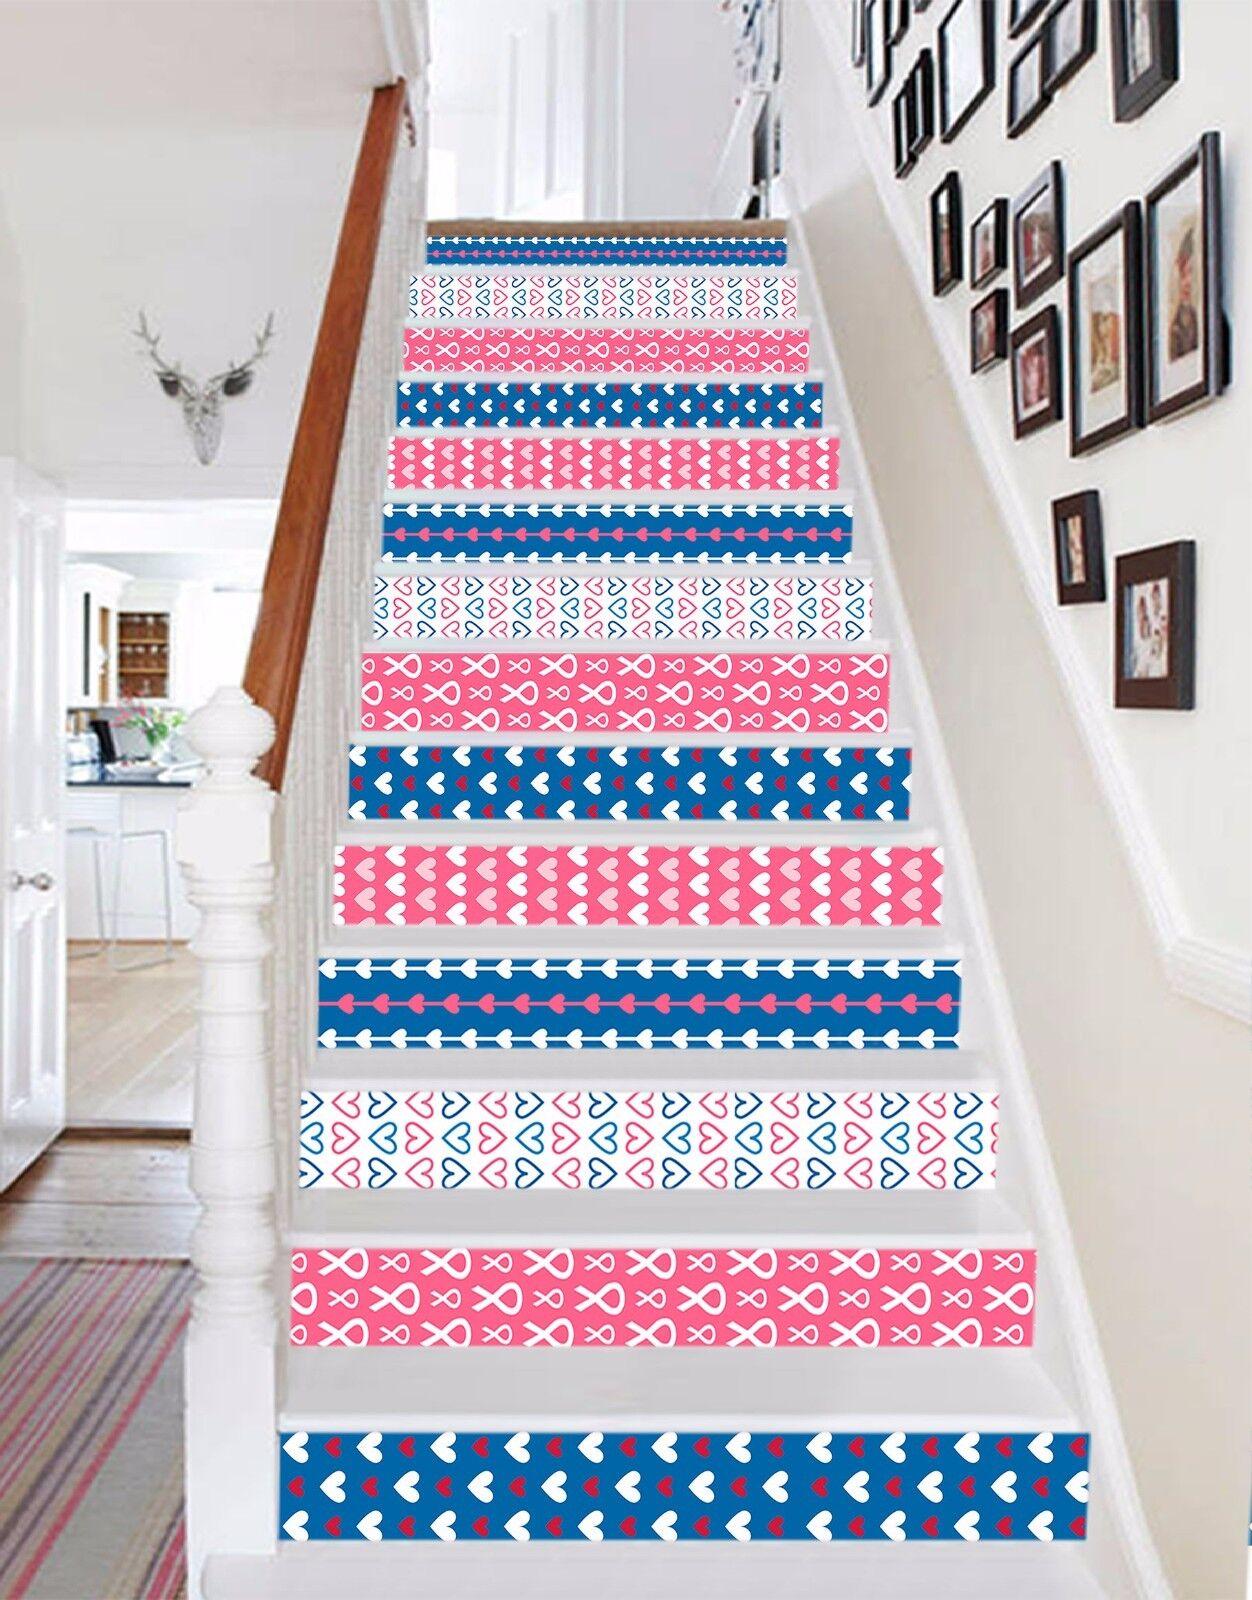 3D Diverse Muster 3 Stair Risers Dekoration Fototapete Vinyl Aufkleber Tapete DE